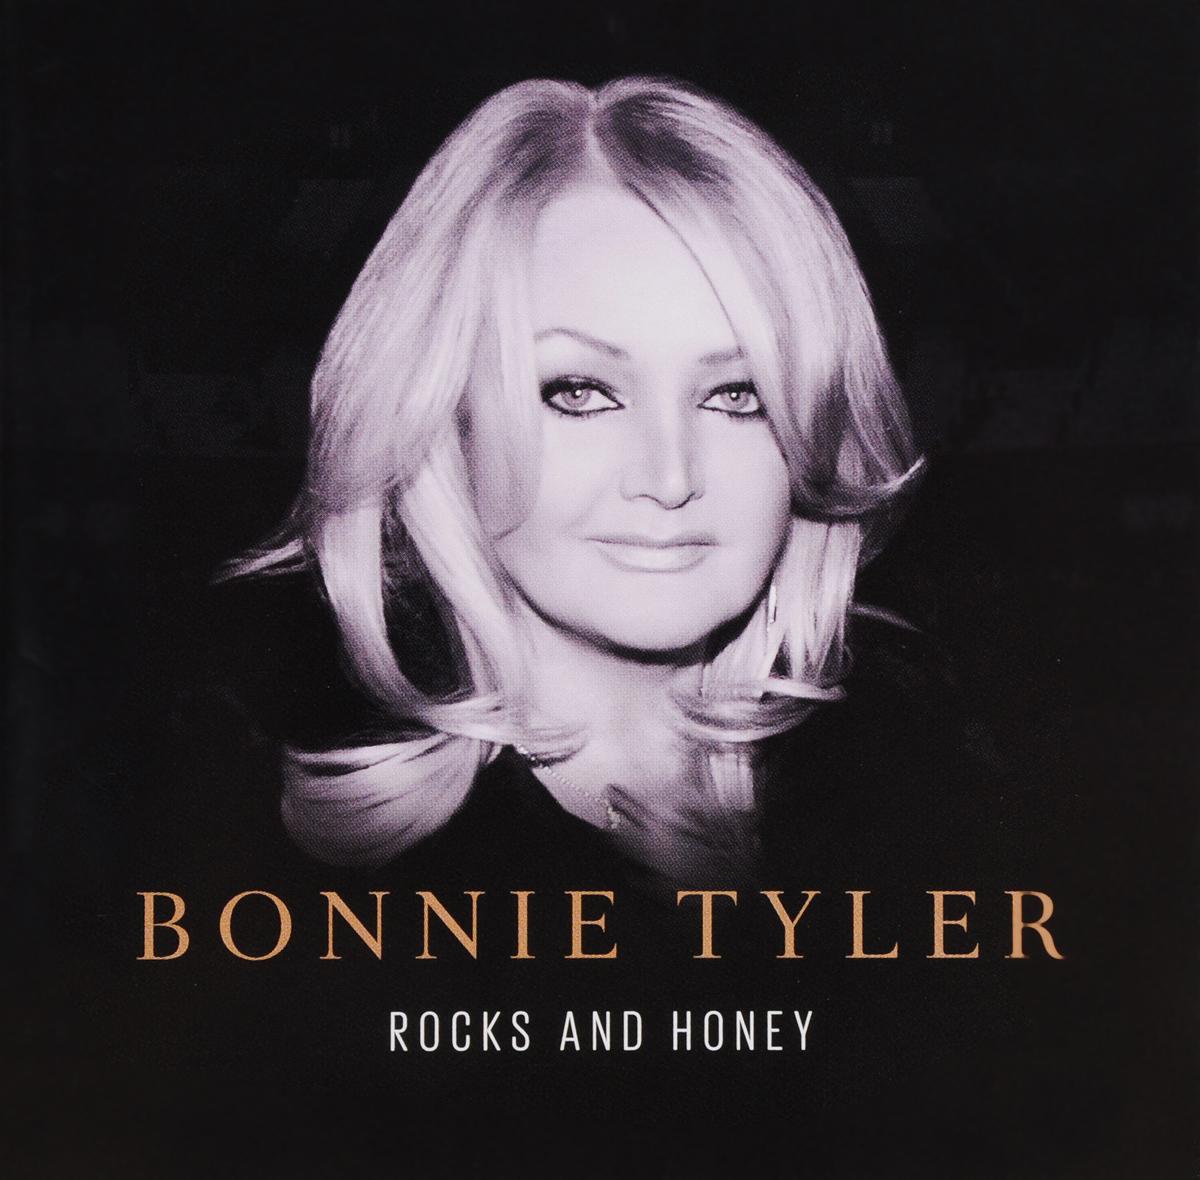 Фото Бонни Тайлер Bonnie Tyler. Rocks And Honey